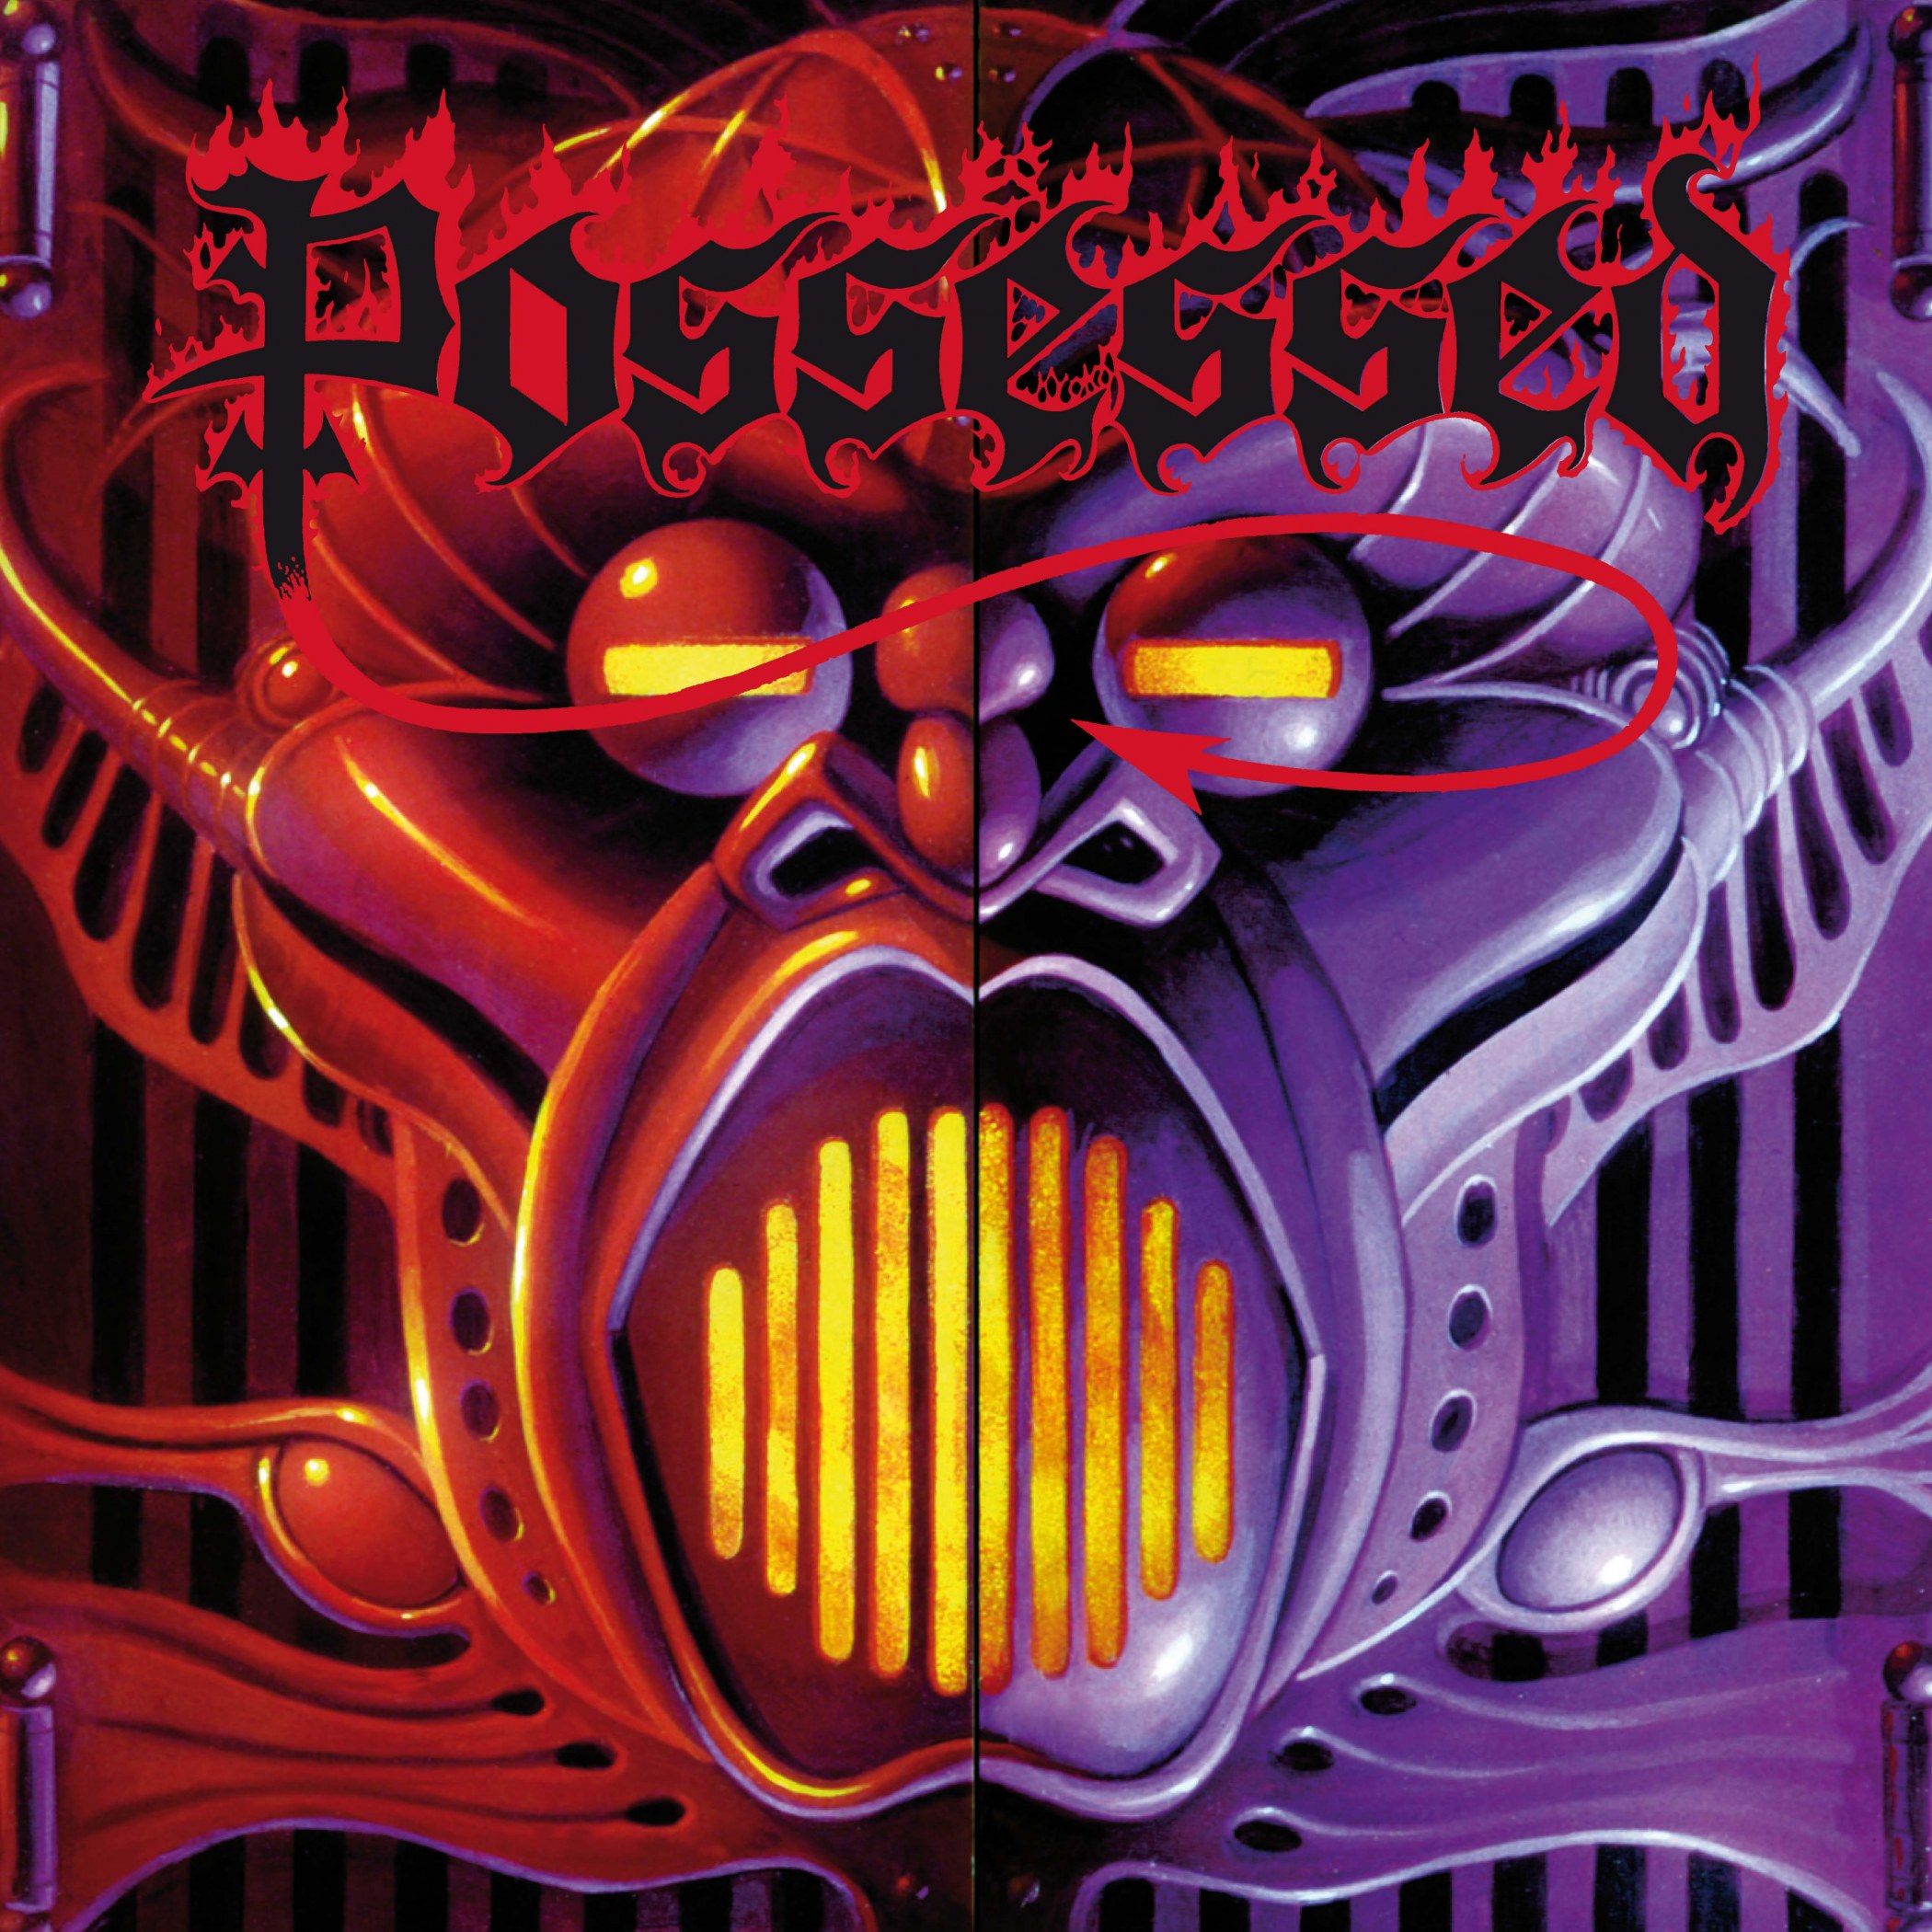 Possessed - Beyond the Gates